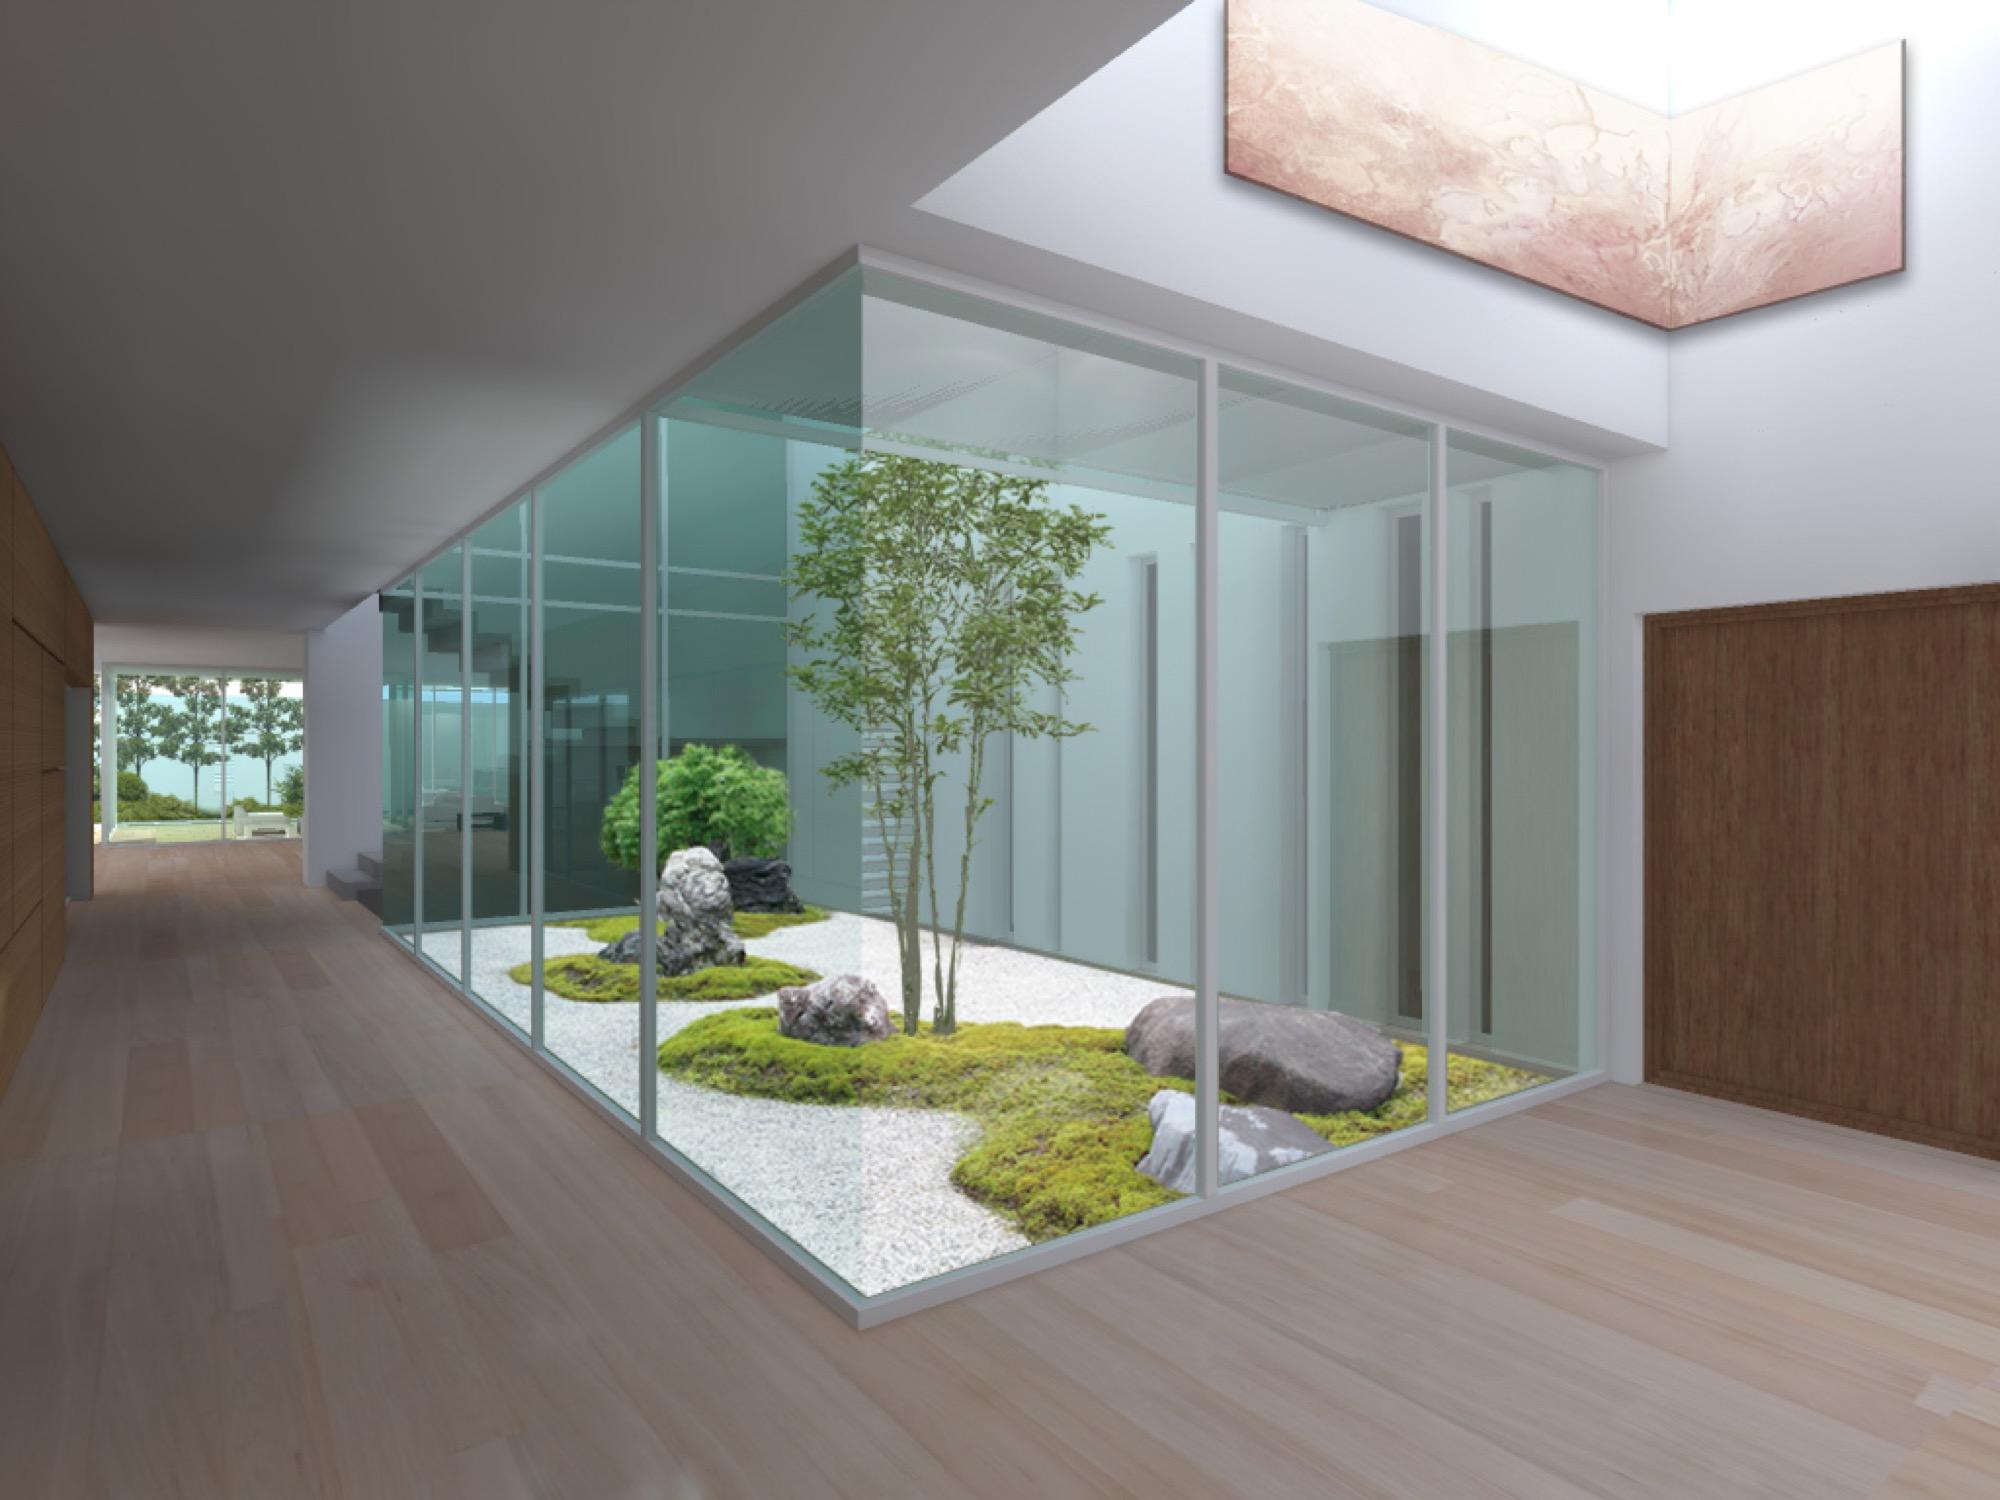 VISTA interior 2